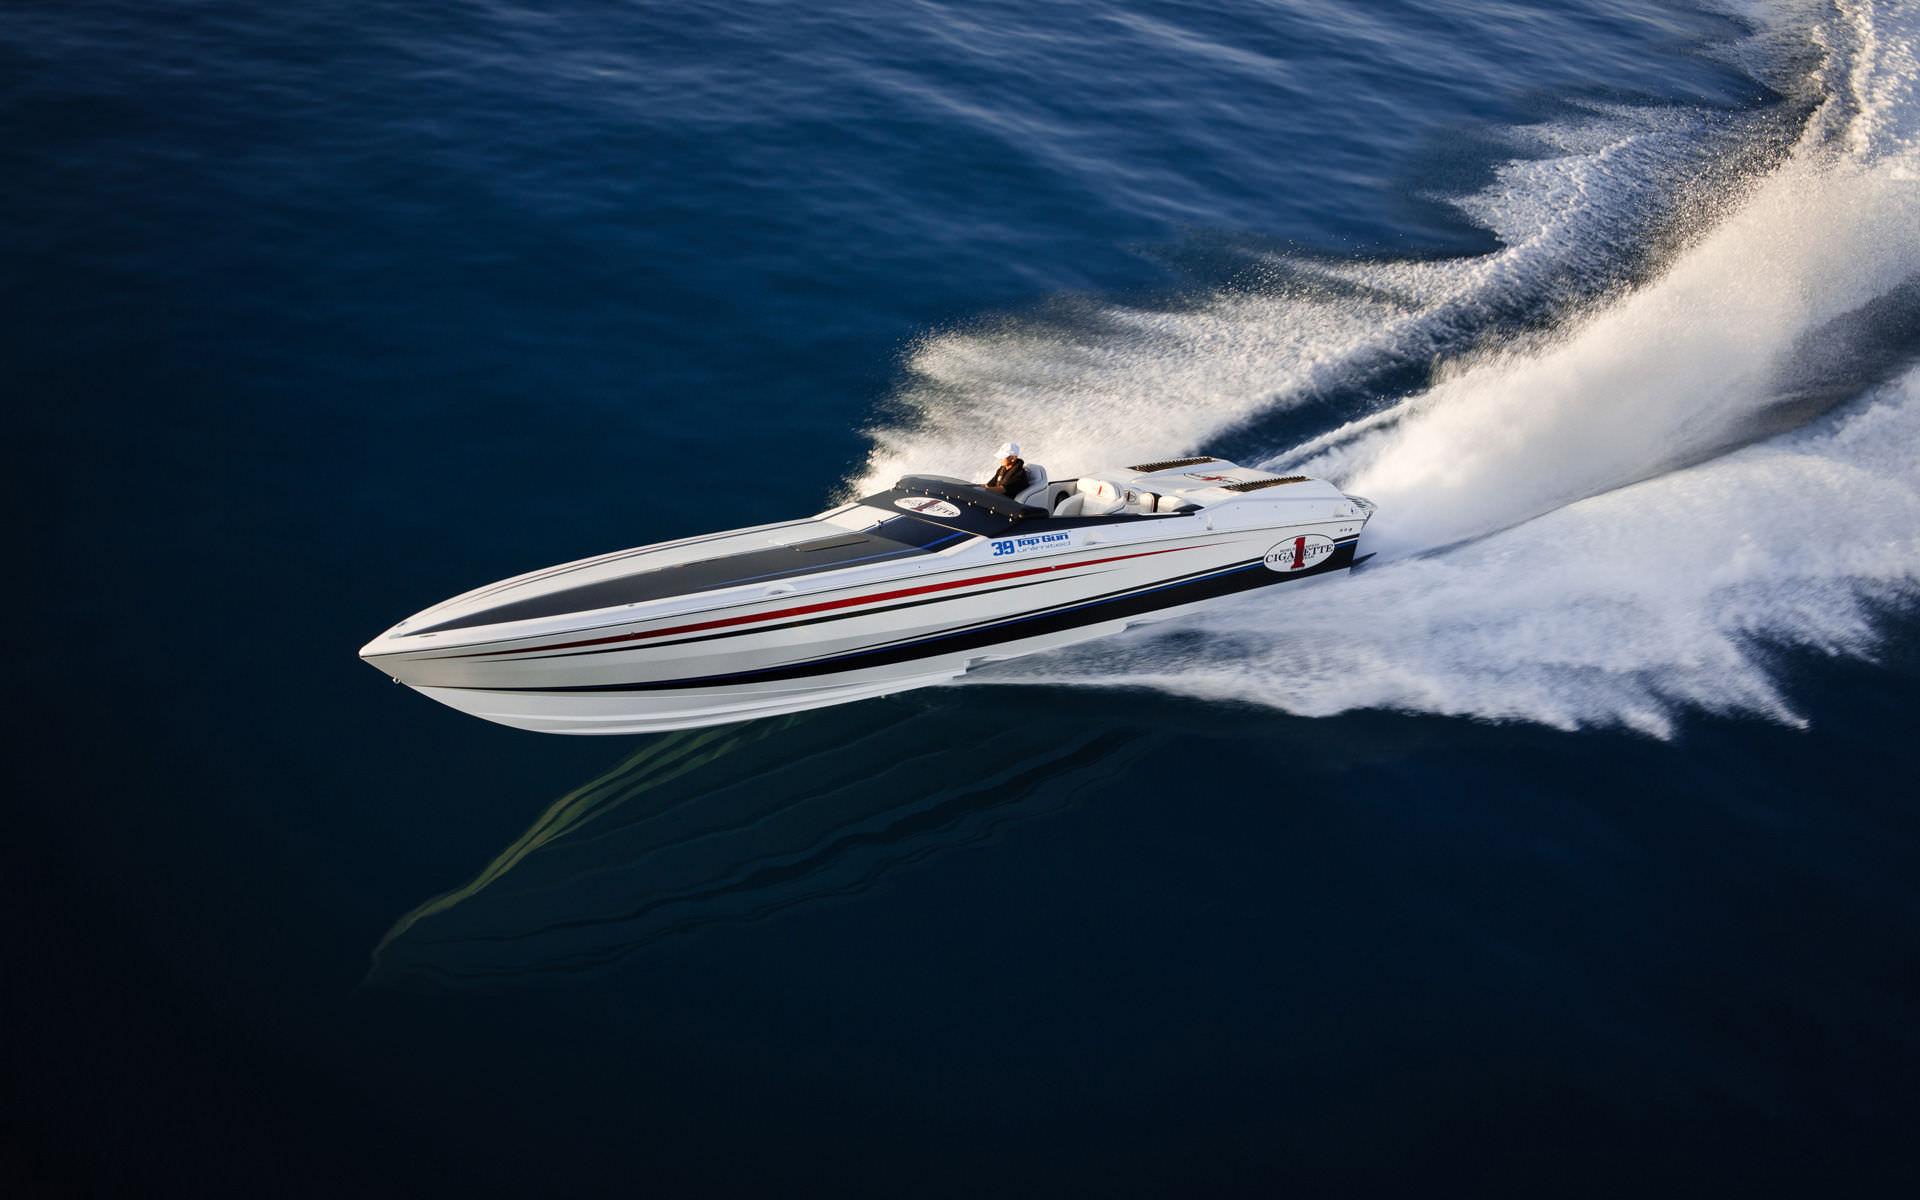 speed boat desktop wallpaper 50998